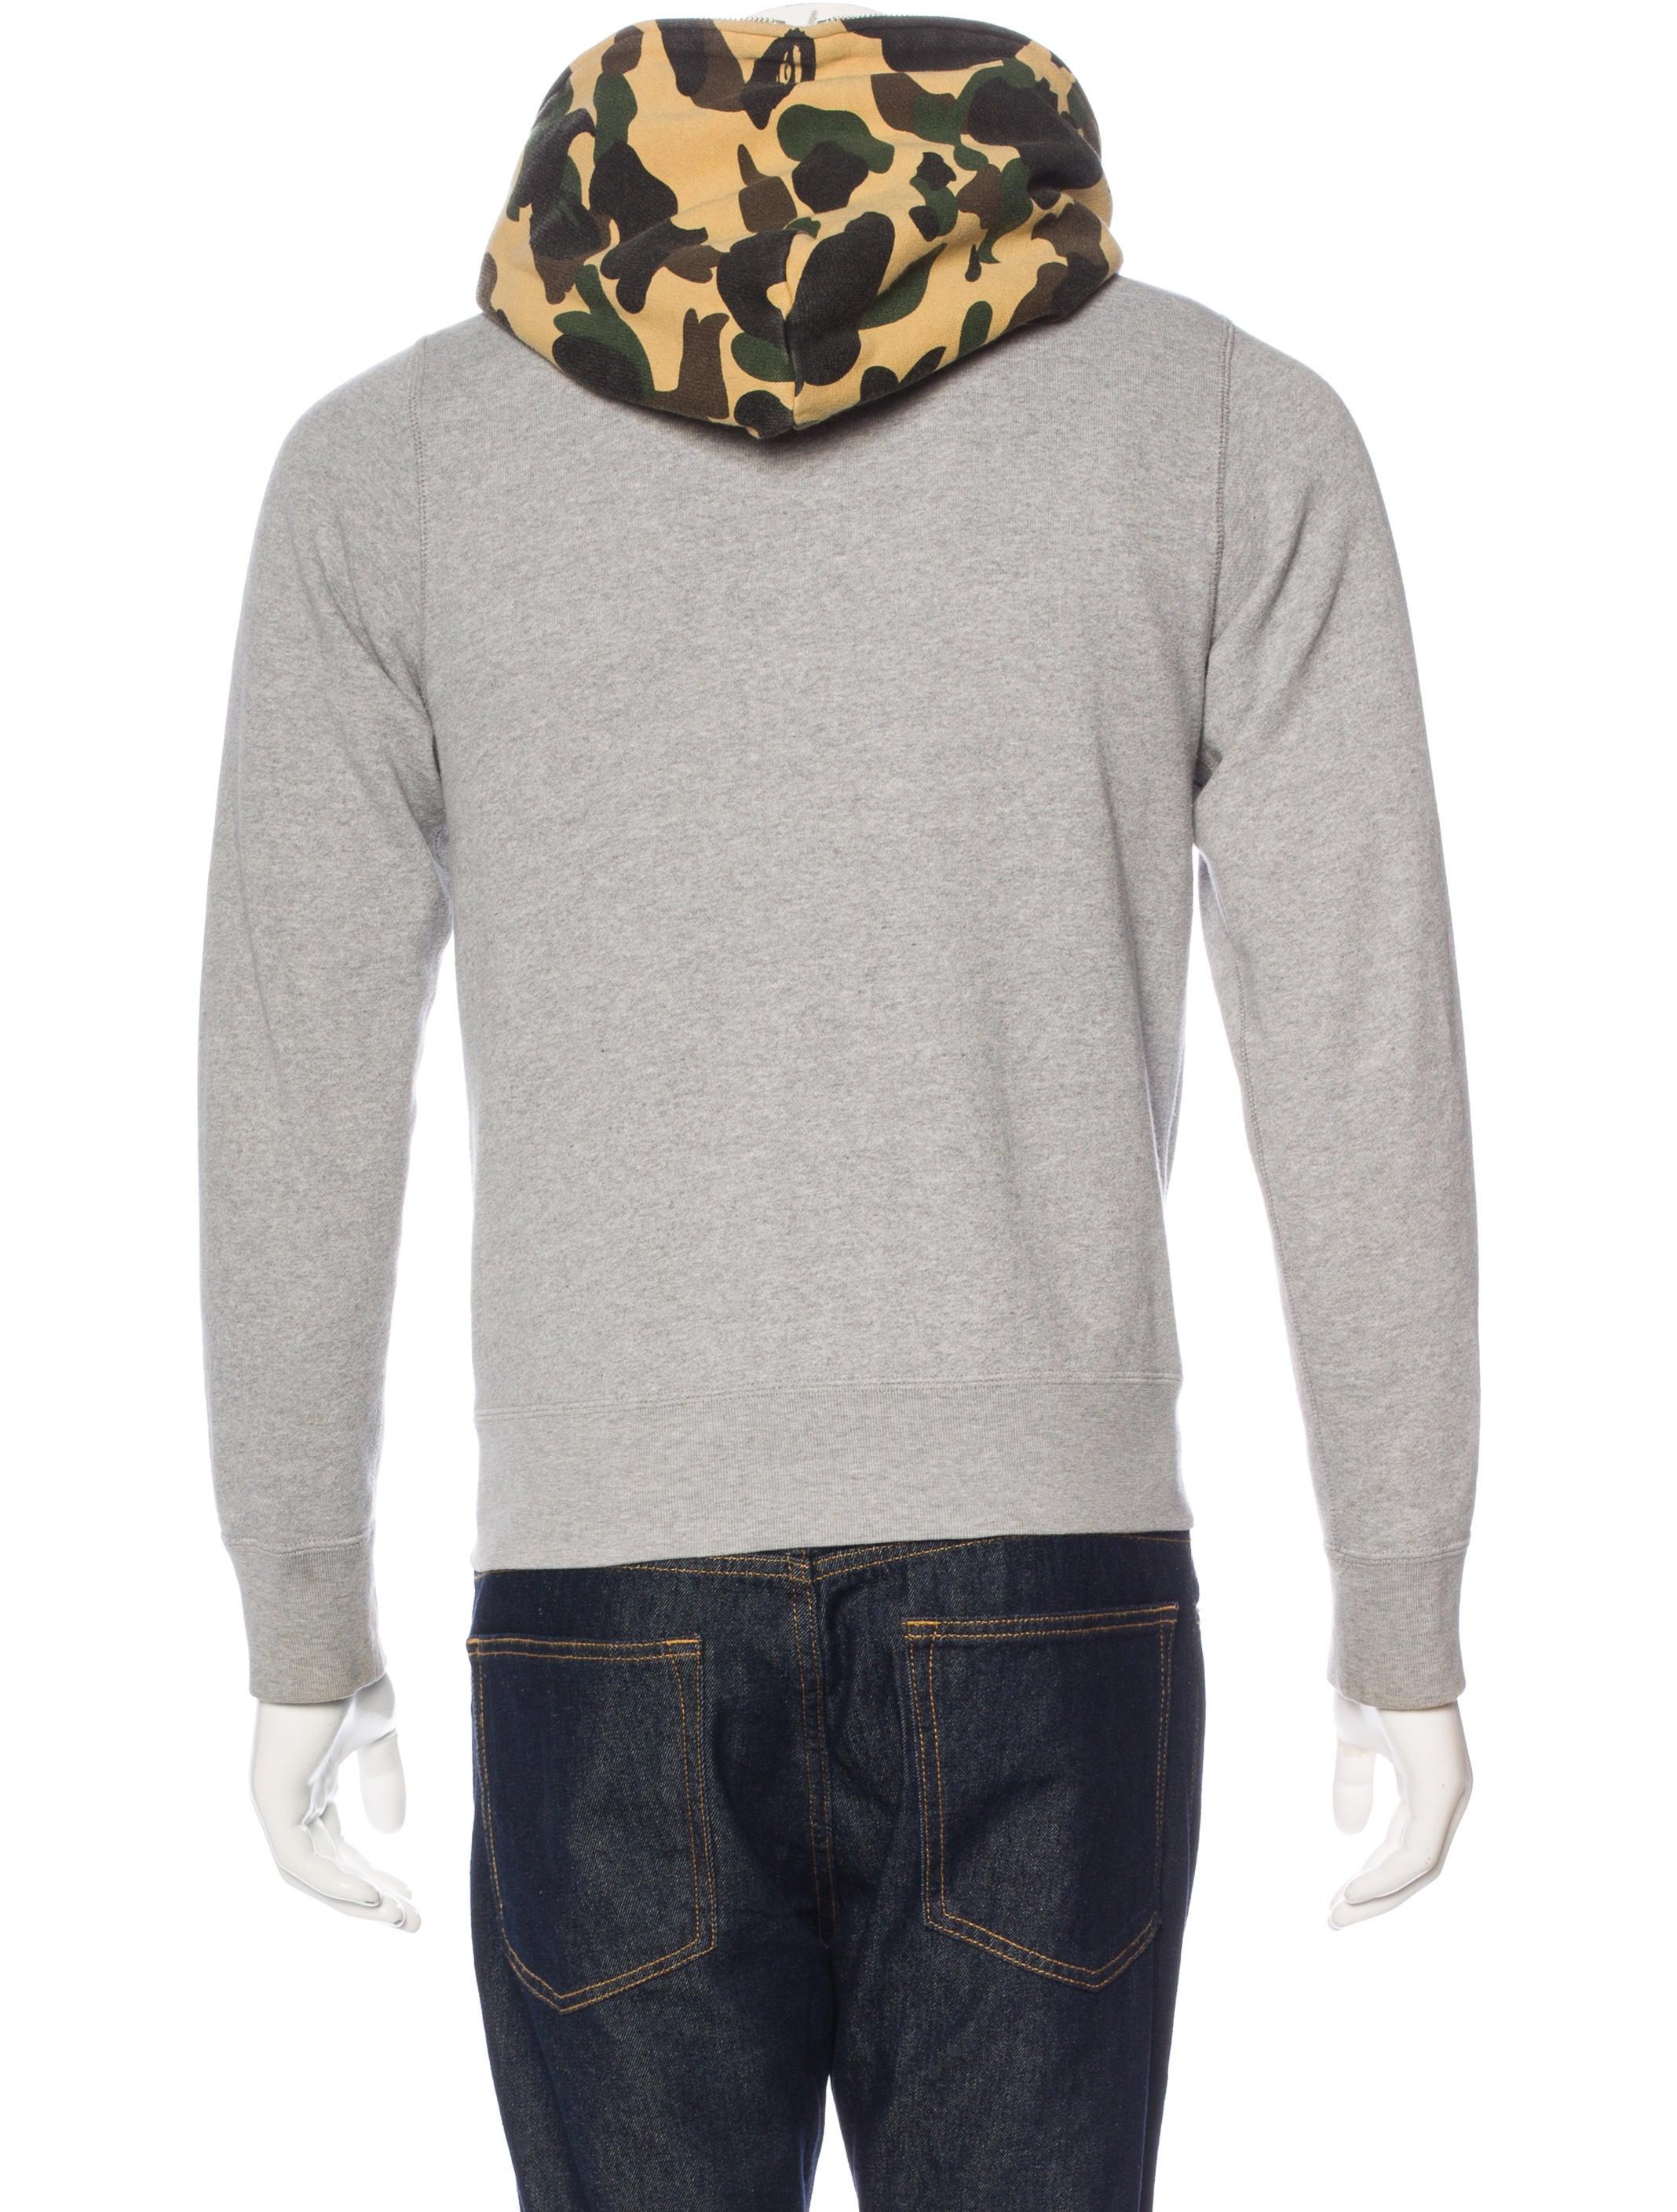 a bathing ape bape camouflagetrimmed hoodie  clothing